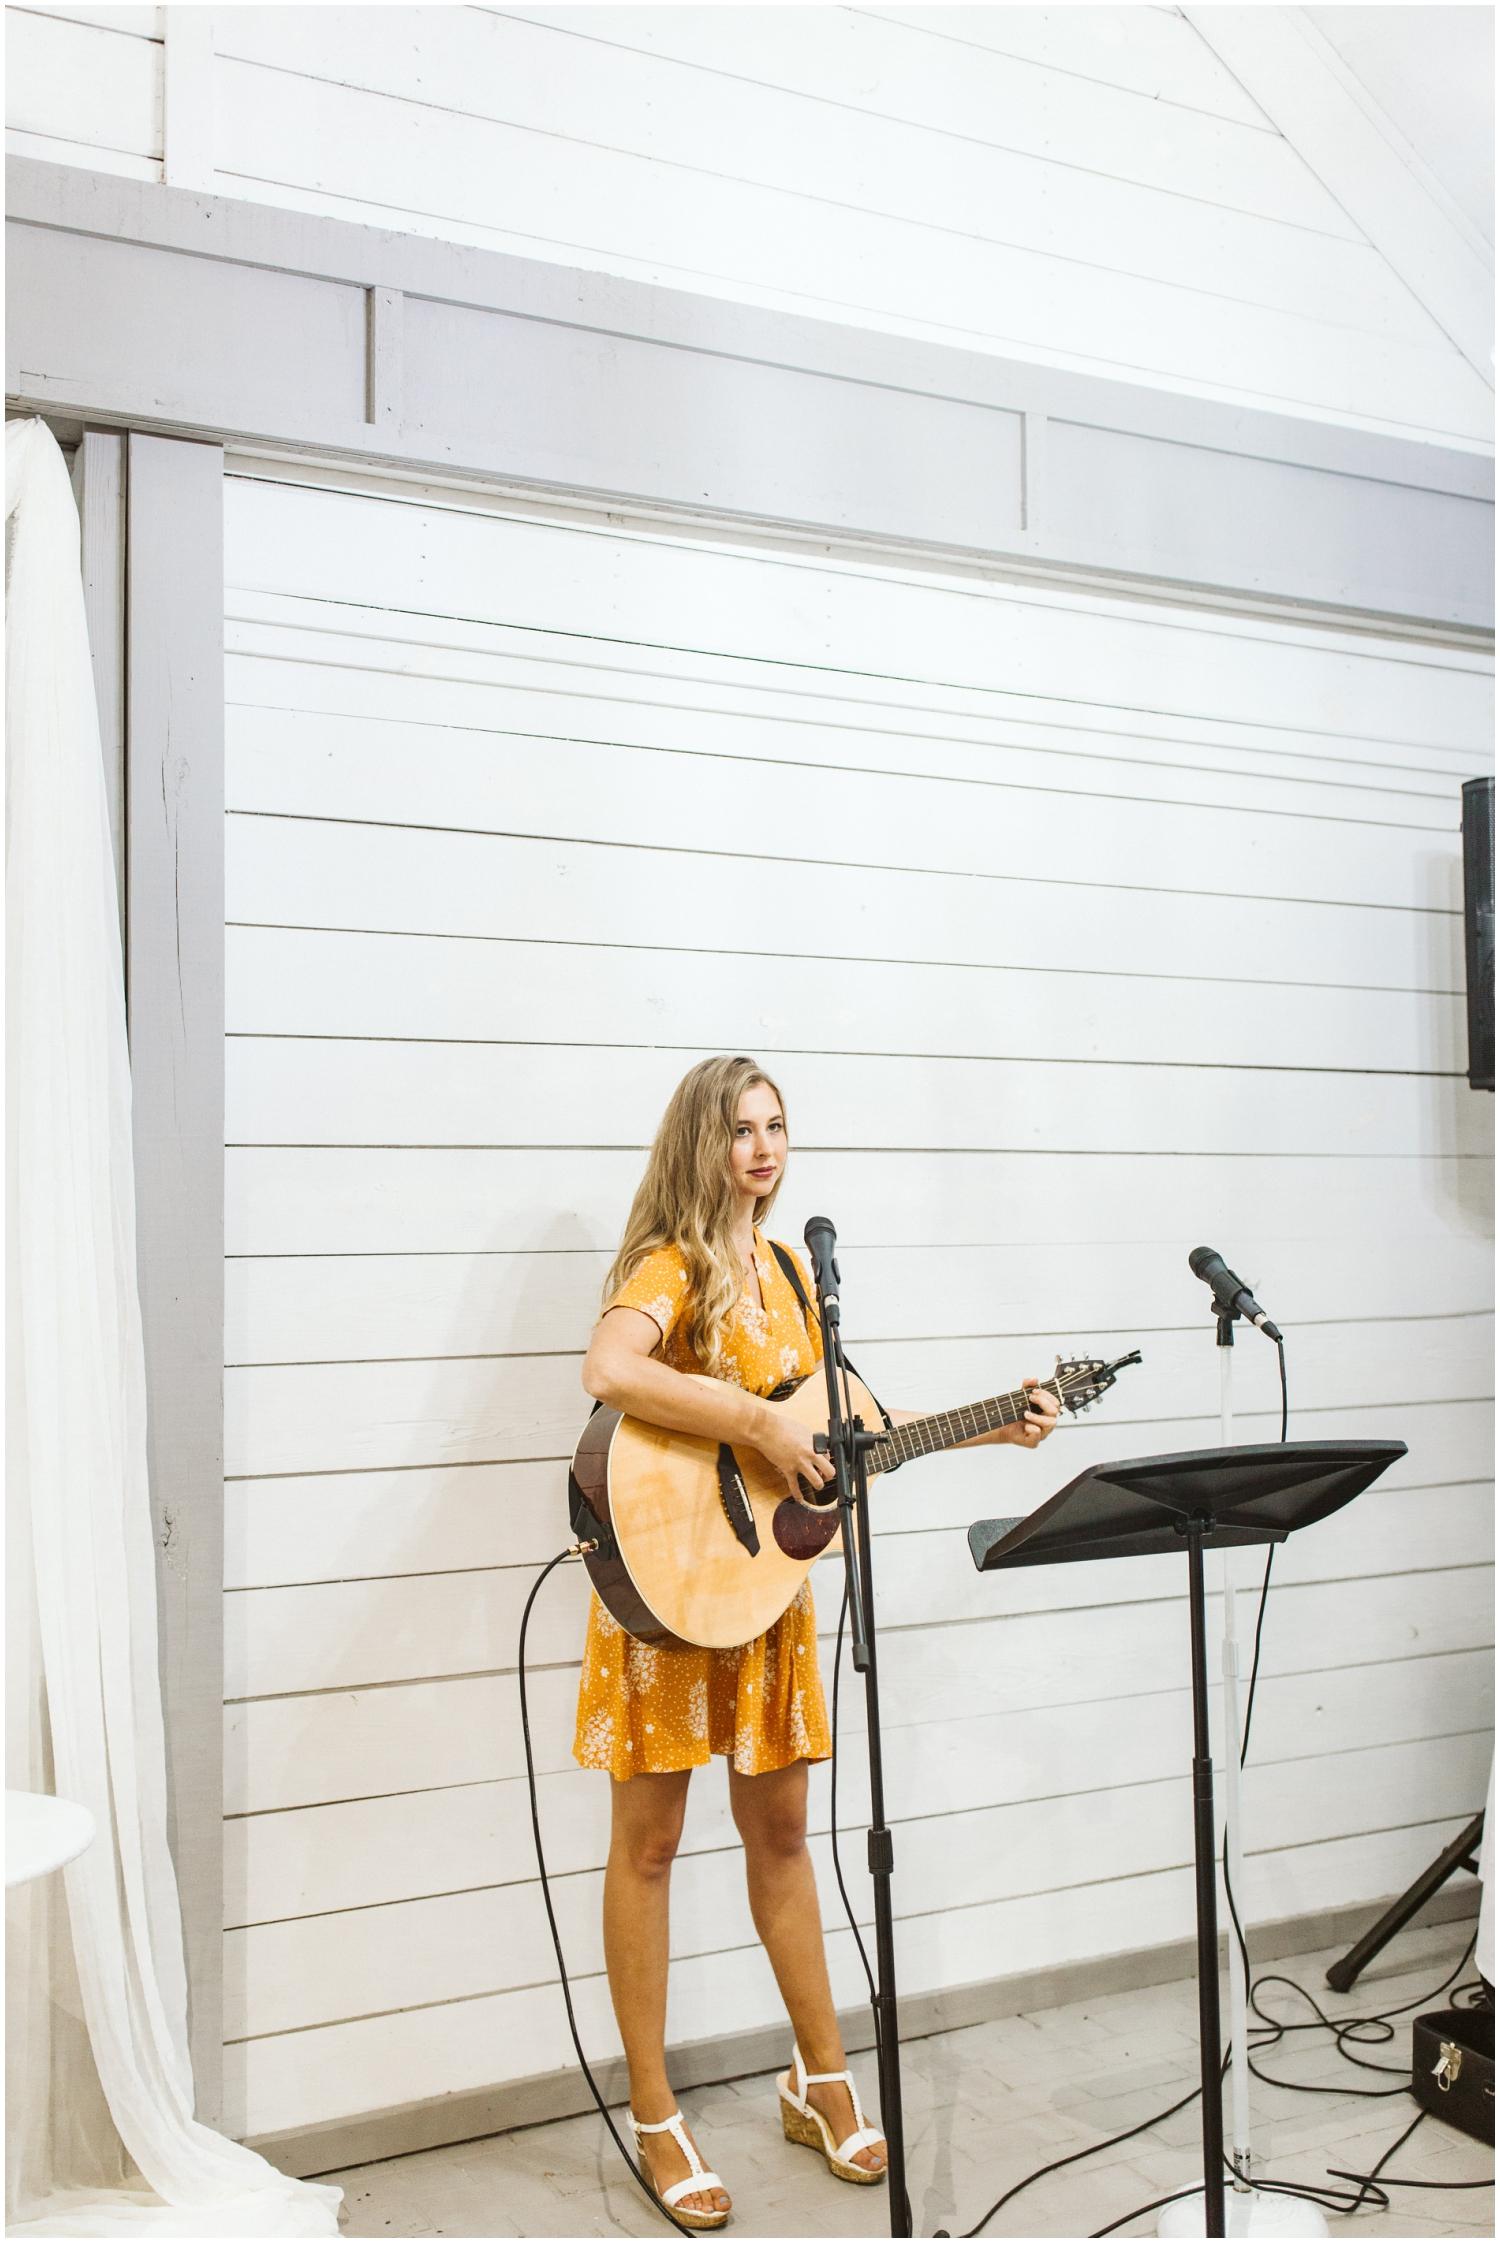 guitarist during wedding ceremony